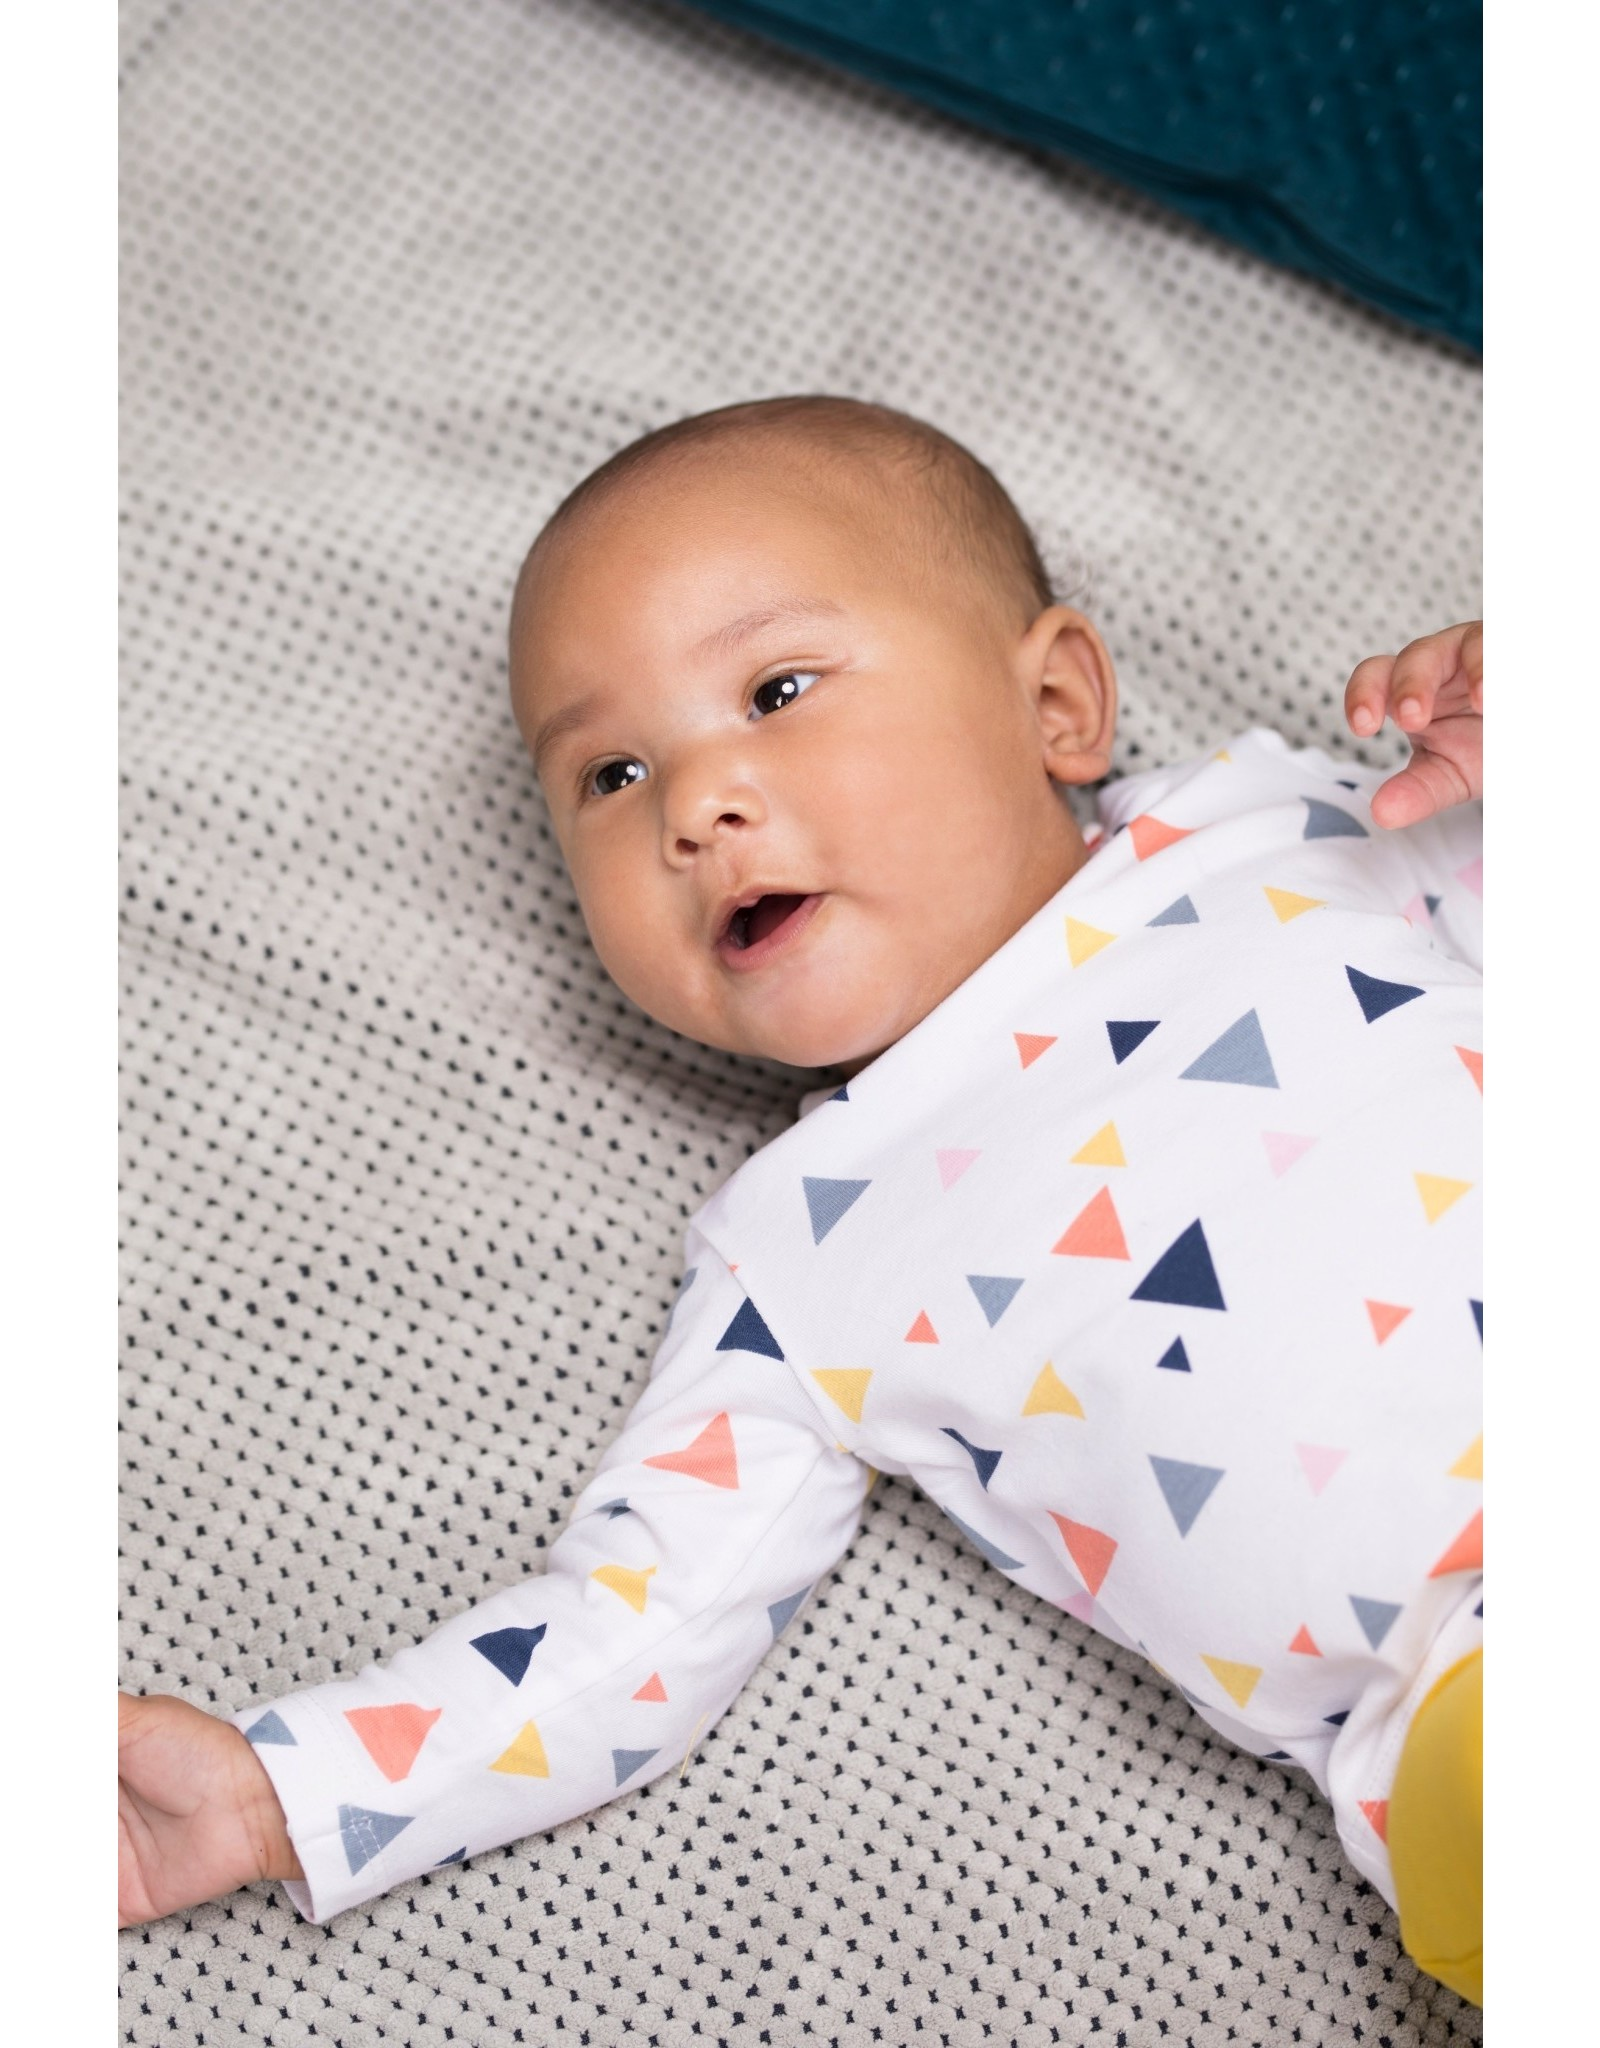 Bampidano Bampidano newborn neutraal shirt Danique White Allover